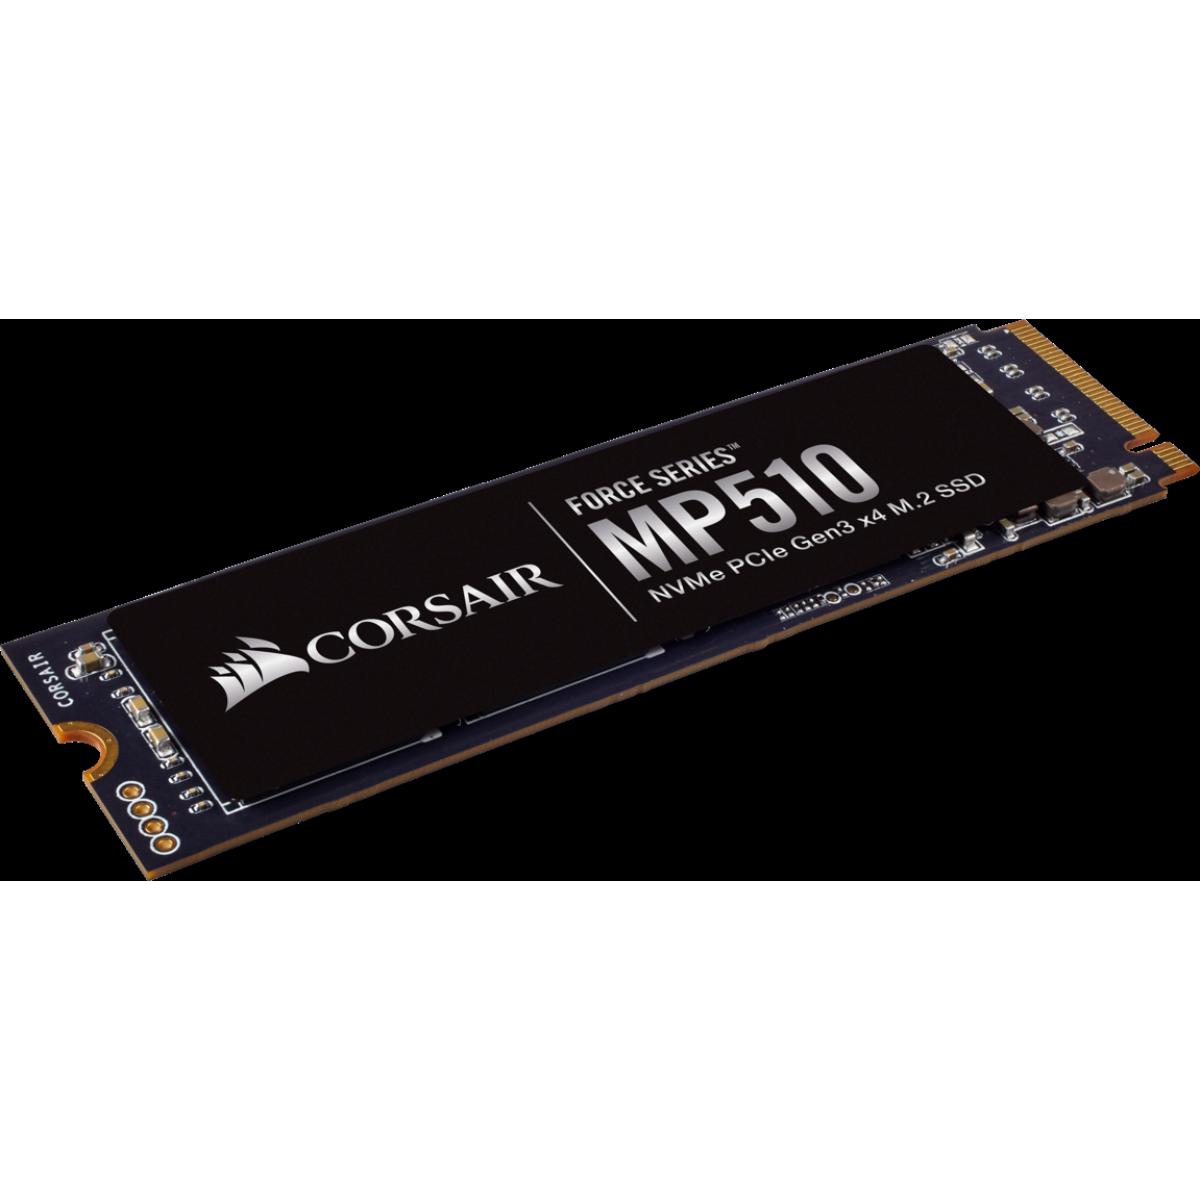 SSD Corsair MP510 1920GB, M.2 2280, Leitura 3.480MBs e Gravação 2.700MBs, CSSD-F1920GBMP510